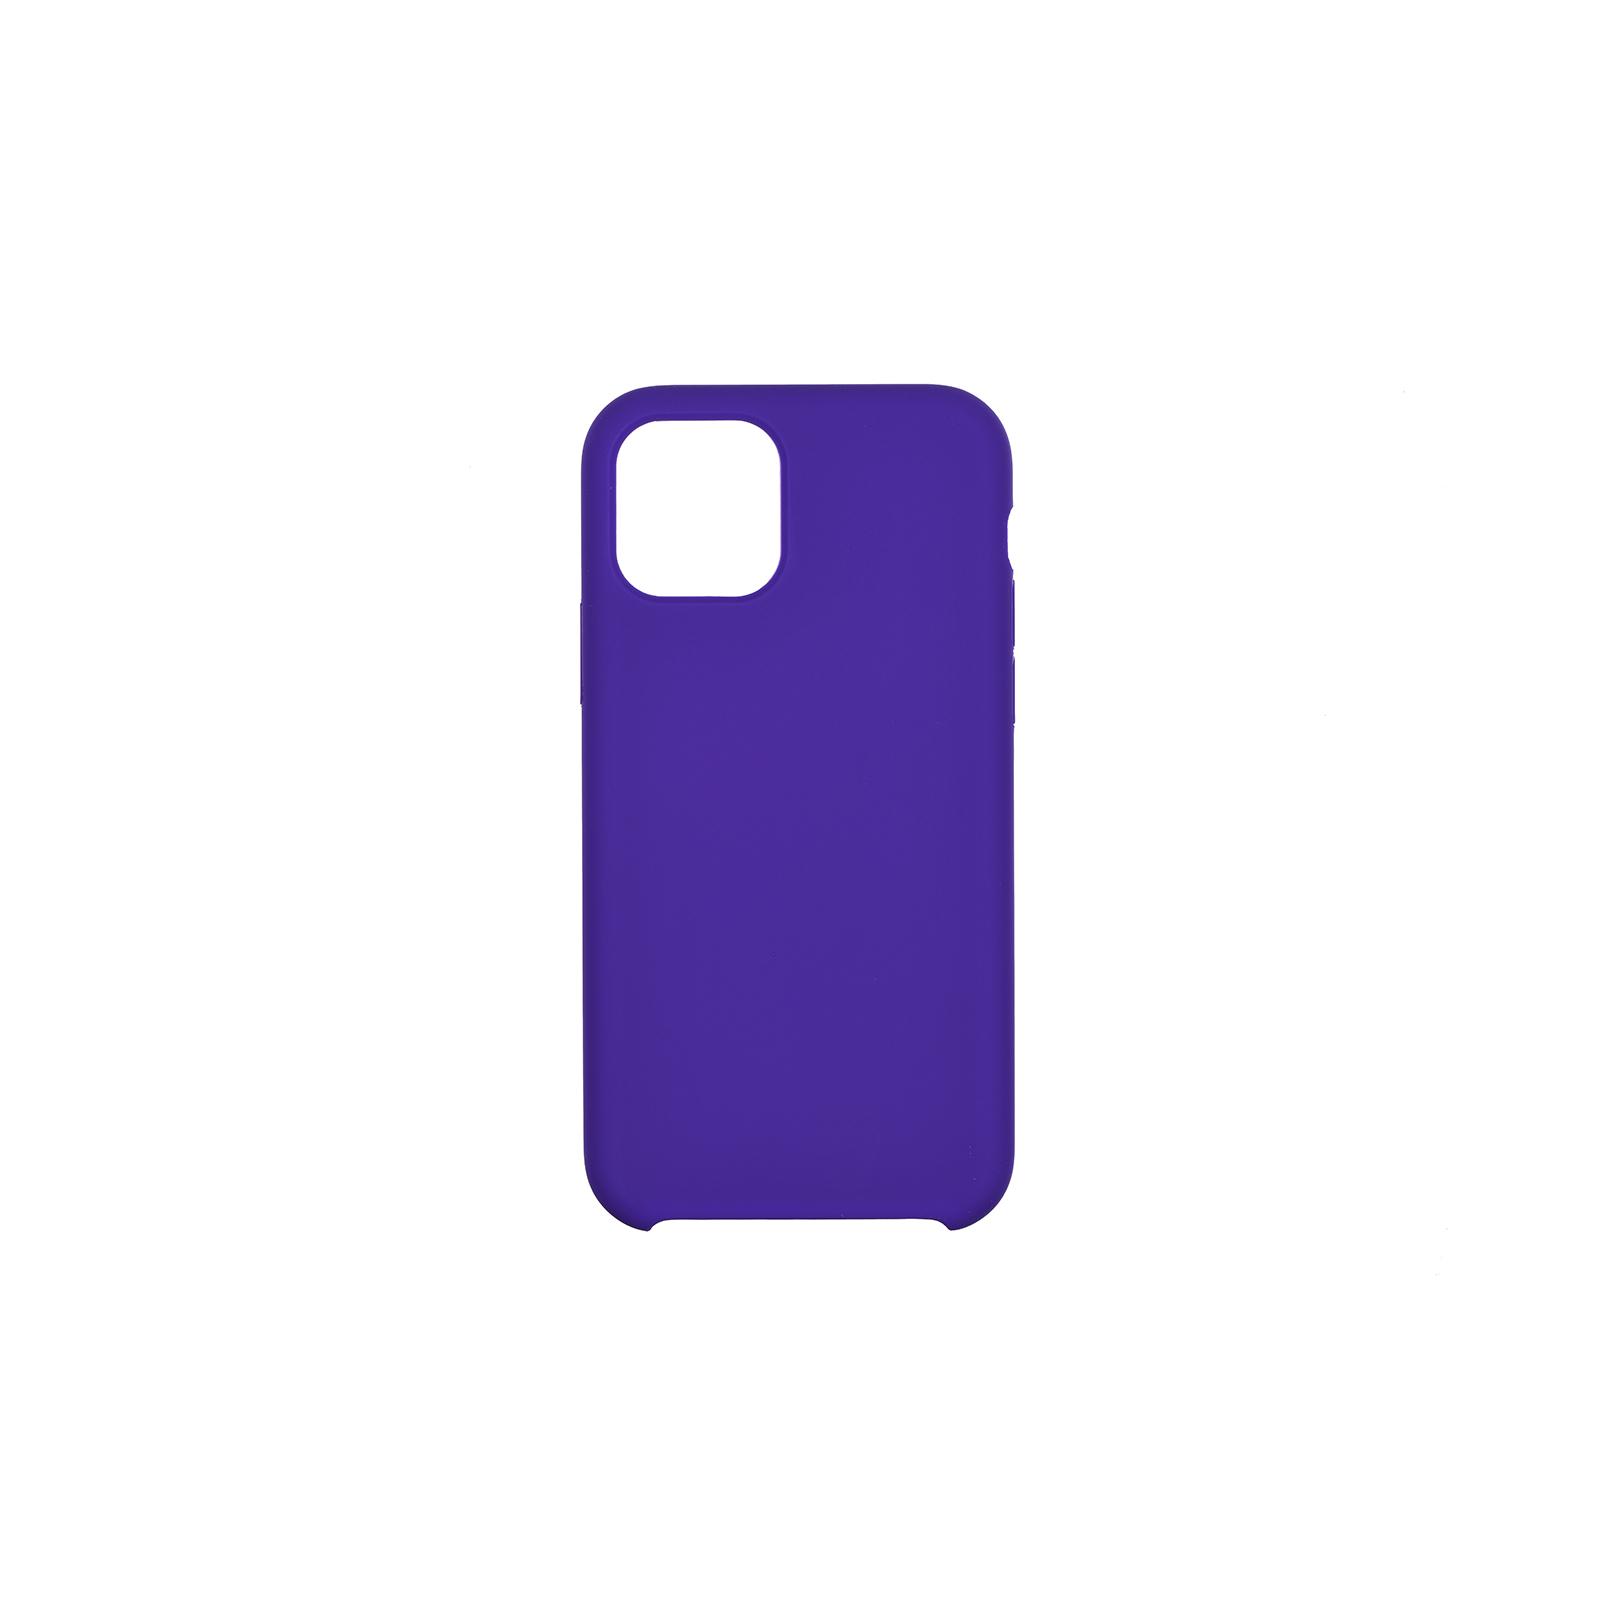 "Чехол для моб. телефона 2E Apple iPhone 11 Pro (5.8""), Liquid Silicone, Dark Purple (2E-IPH-11PR-OCLS-DP)"